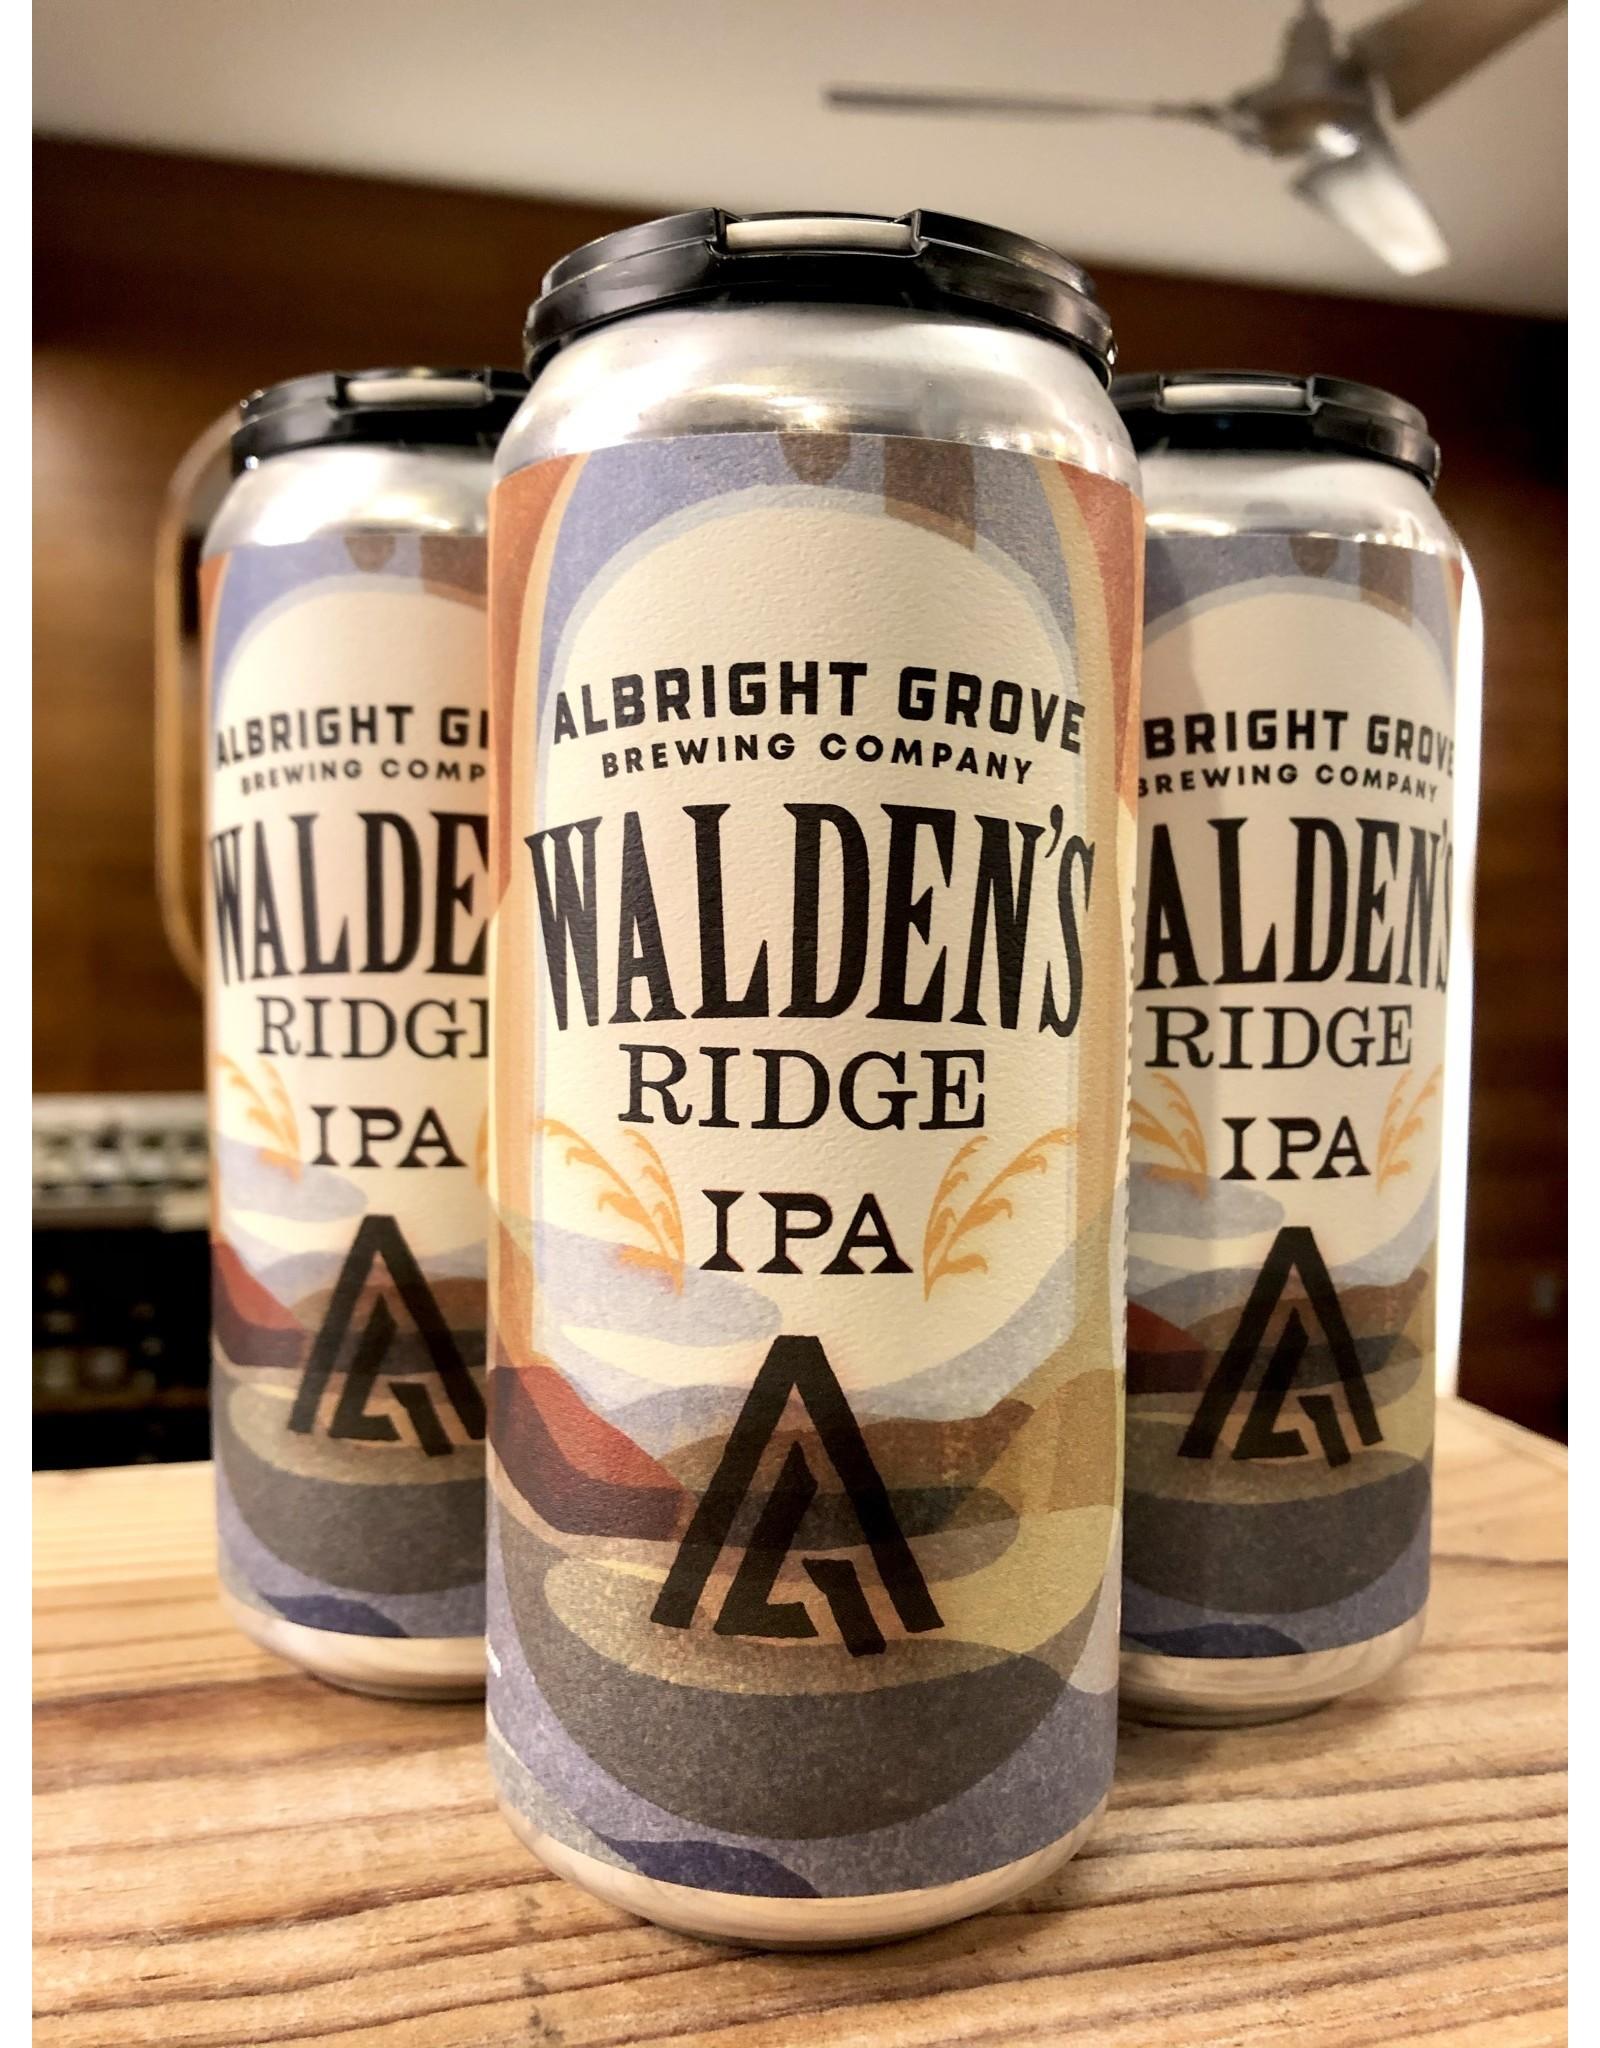 Albright Grove Walden's Ridge IPA - 4x16 oz.